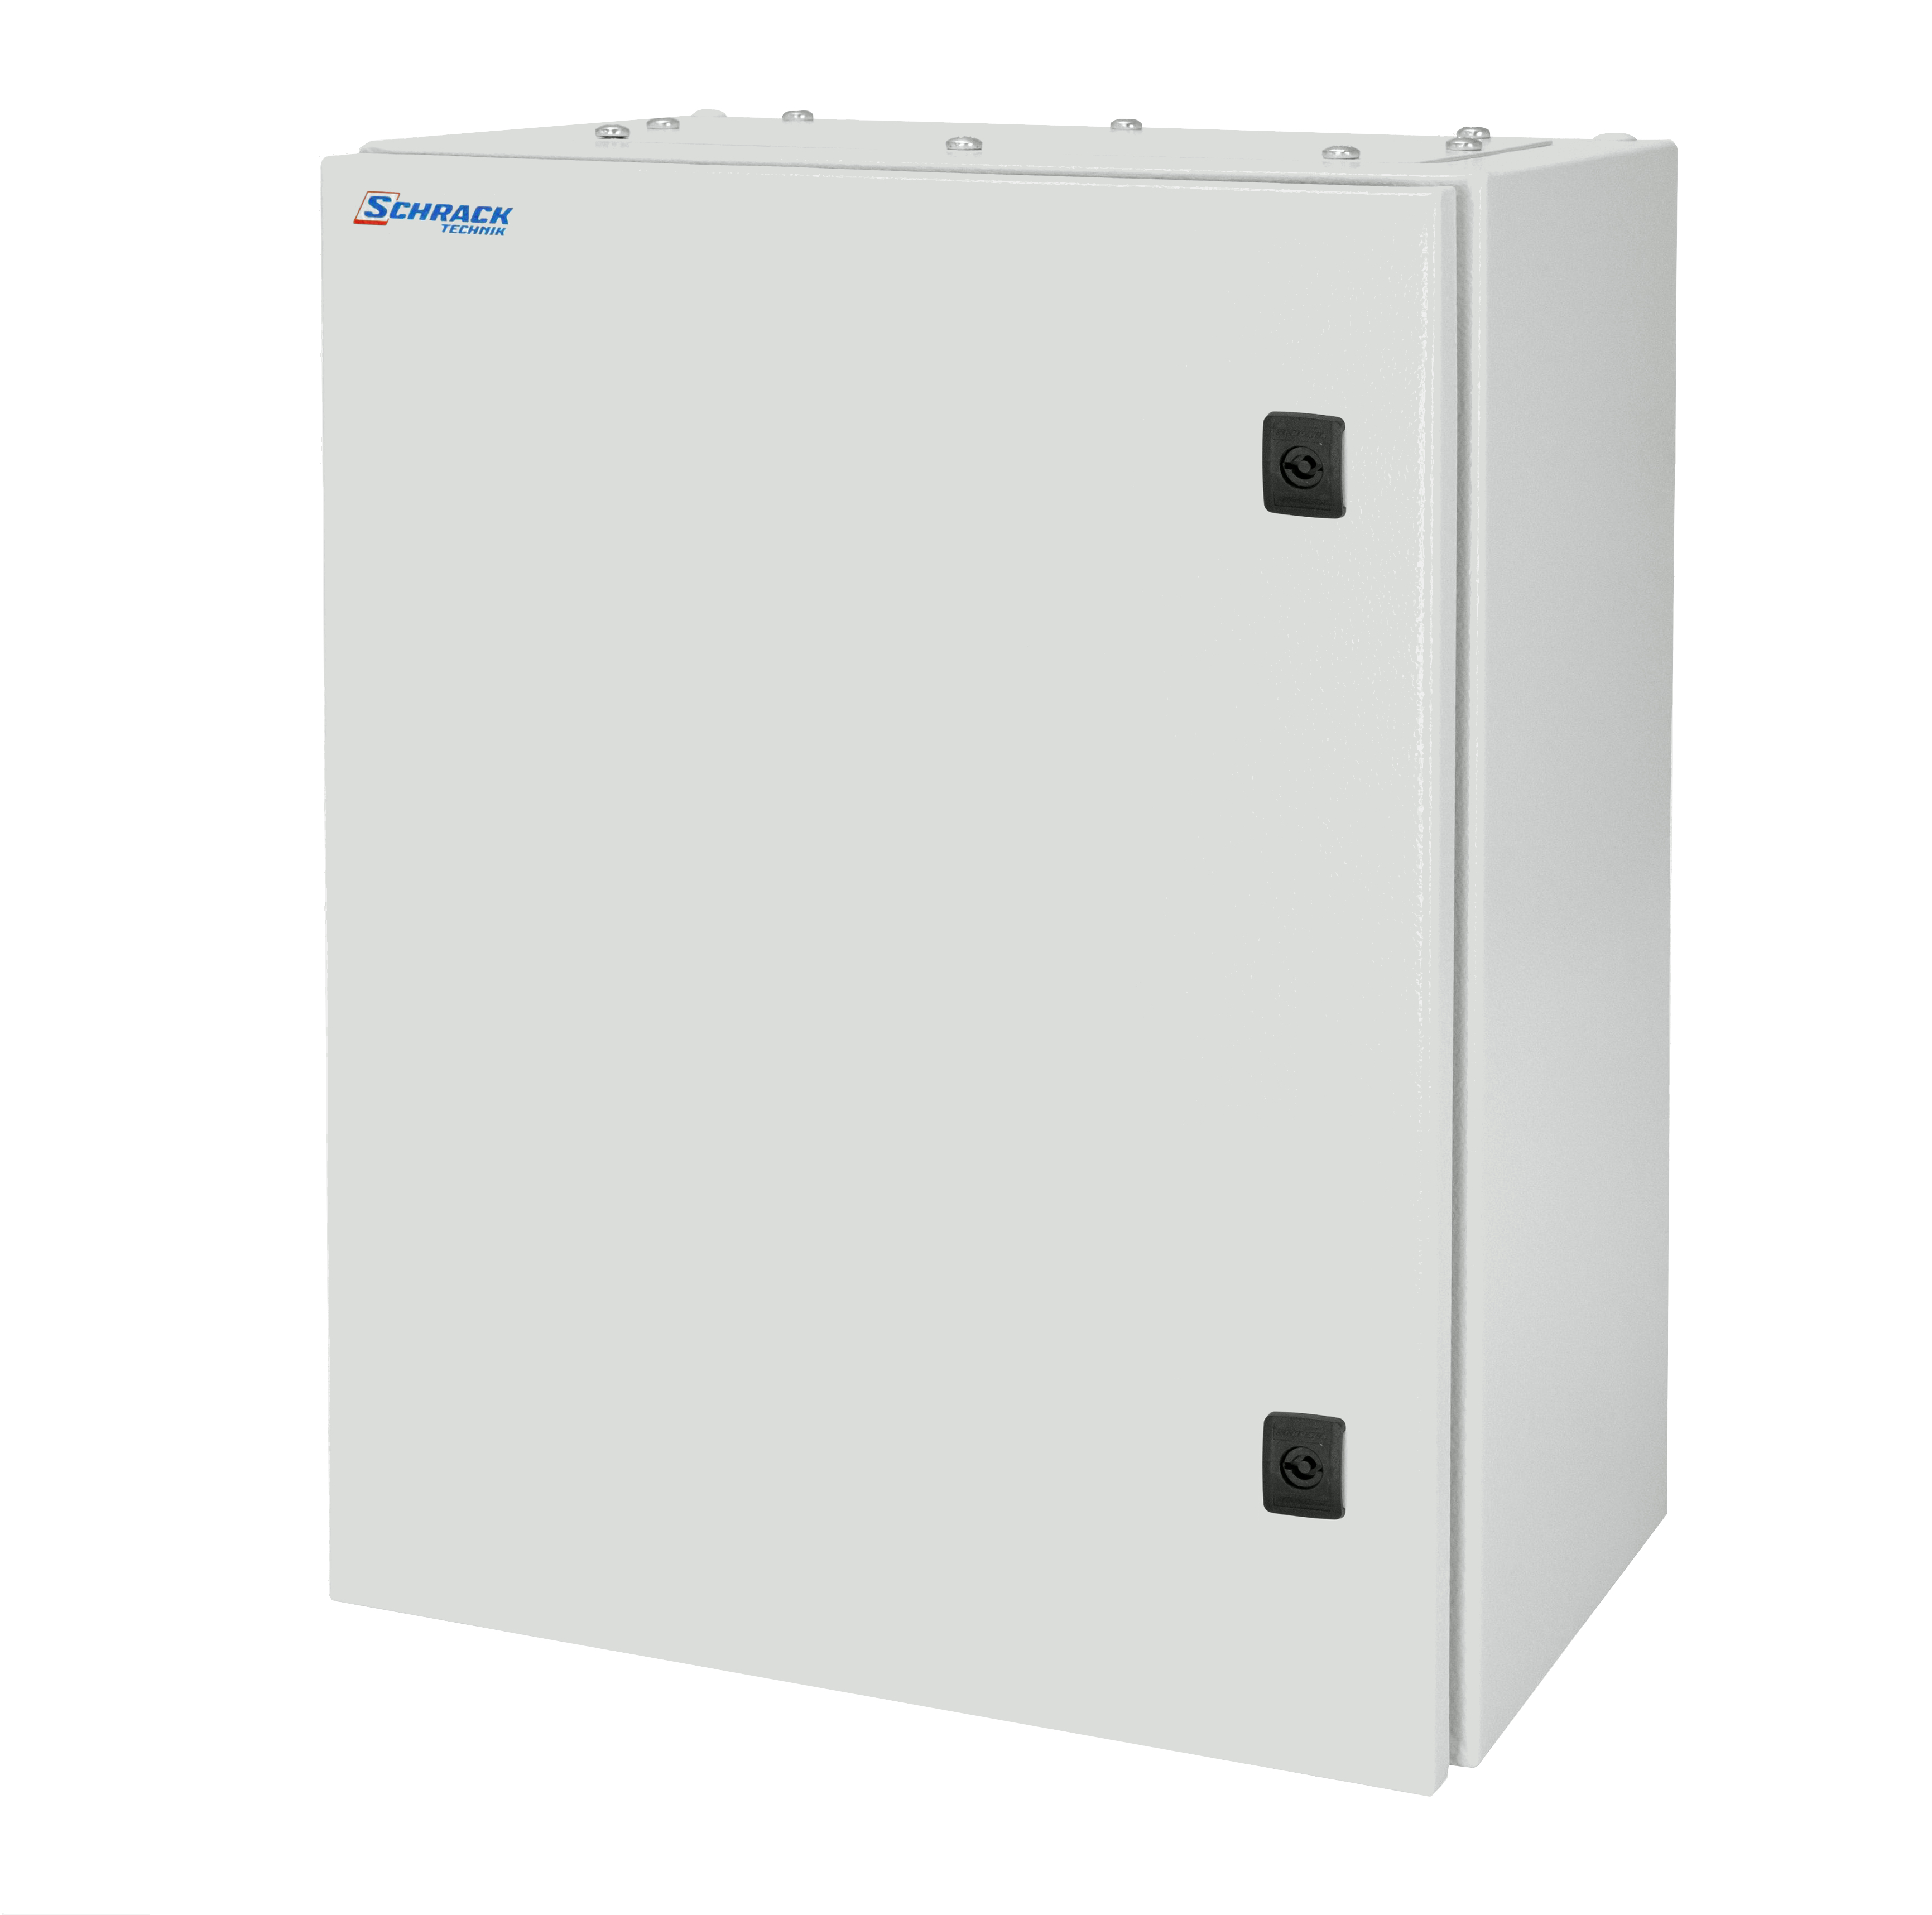 1 Stk Wandschrank Mono IP66 H=600 B=400 T=155 Stahlblech WSM6040150